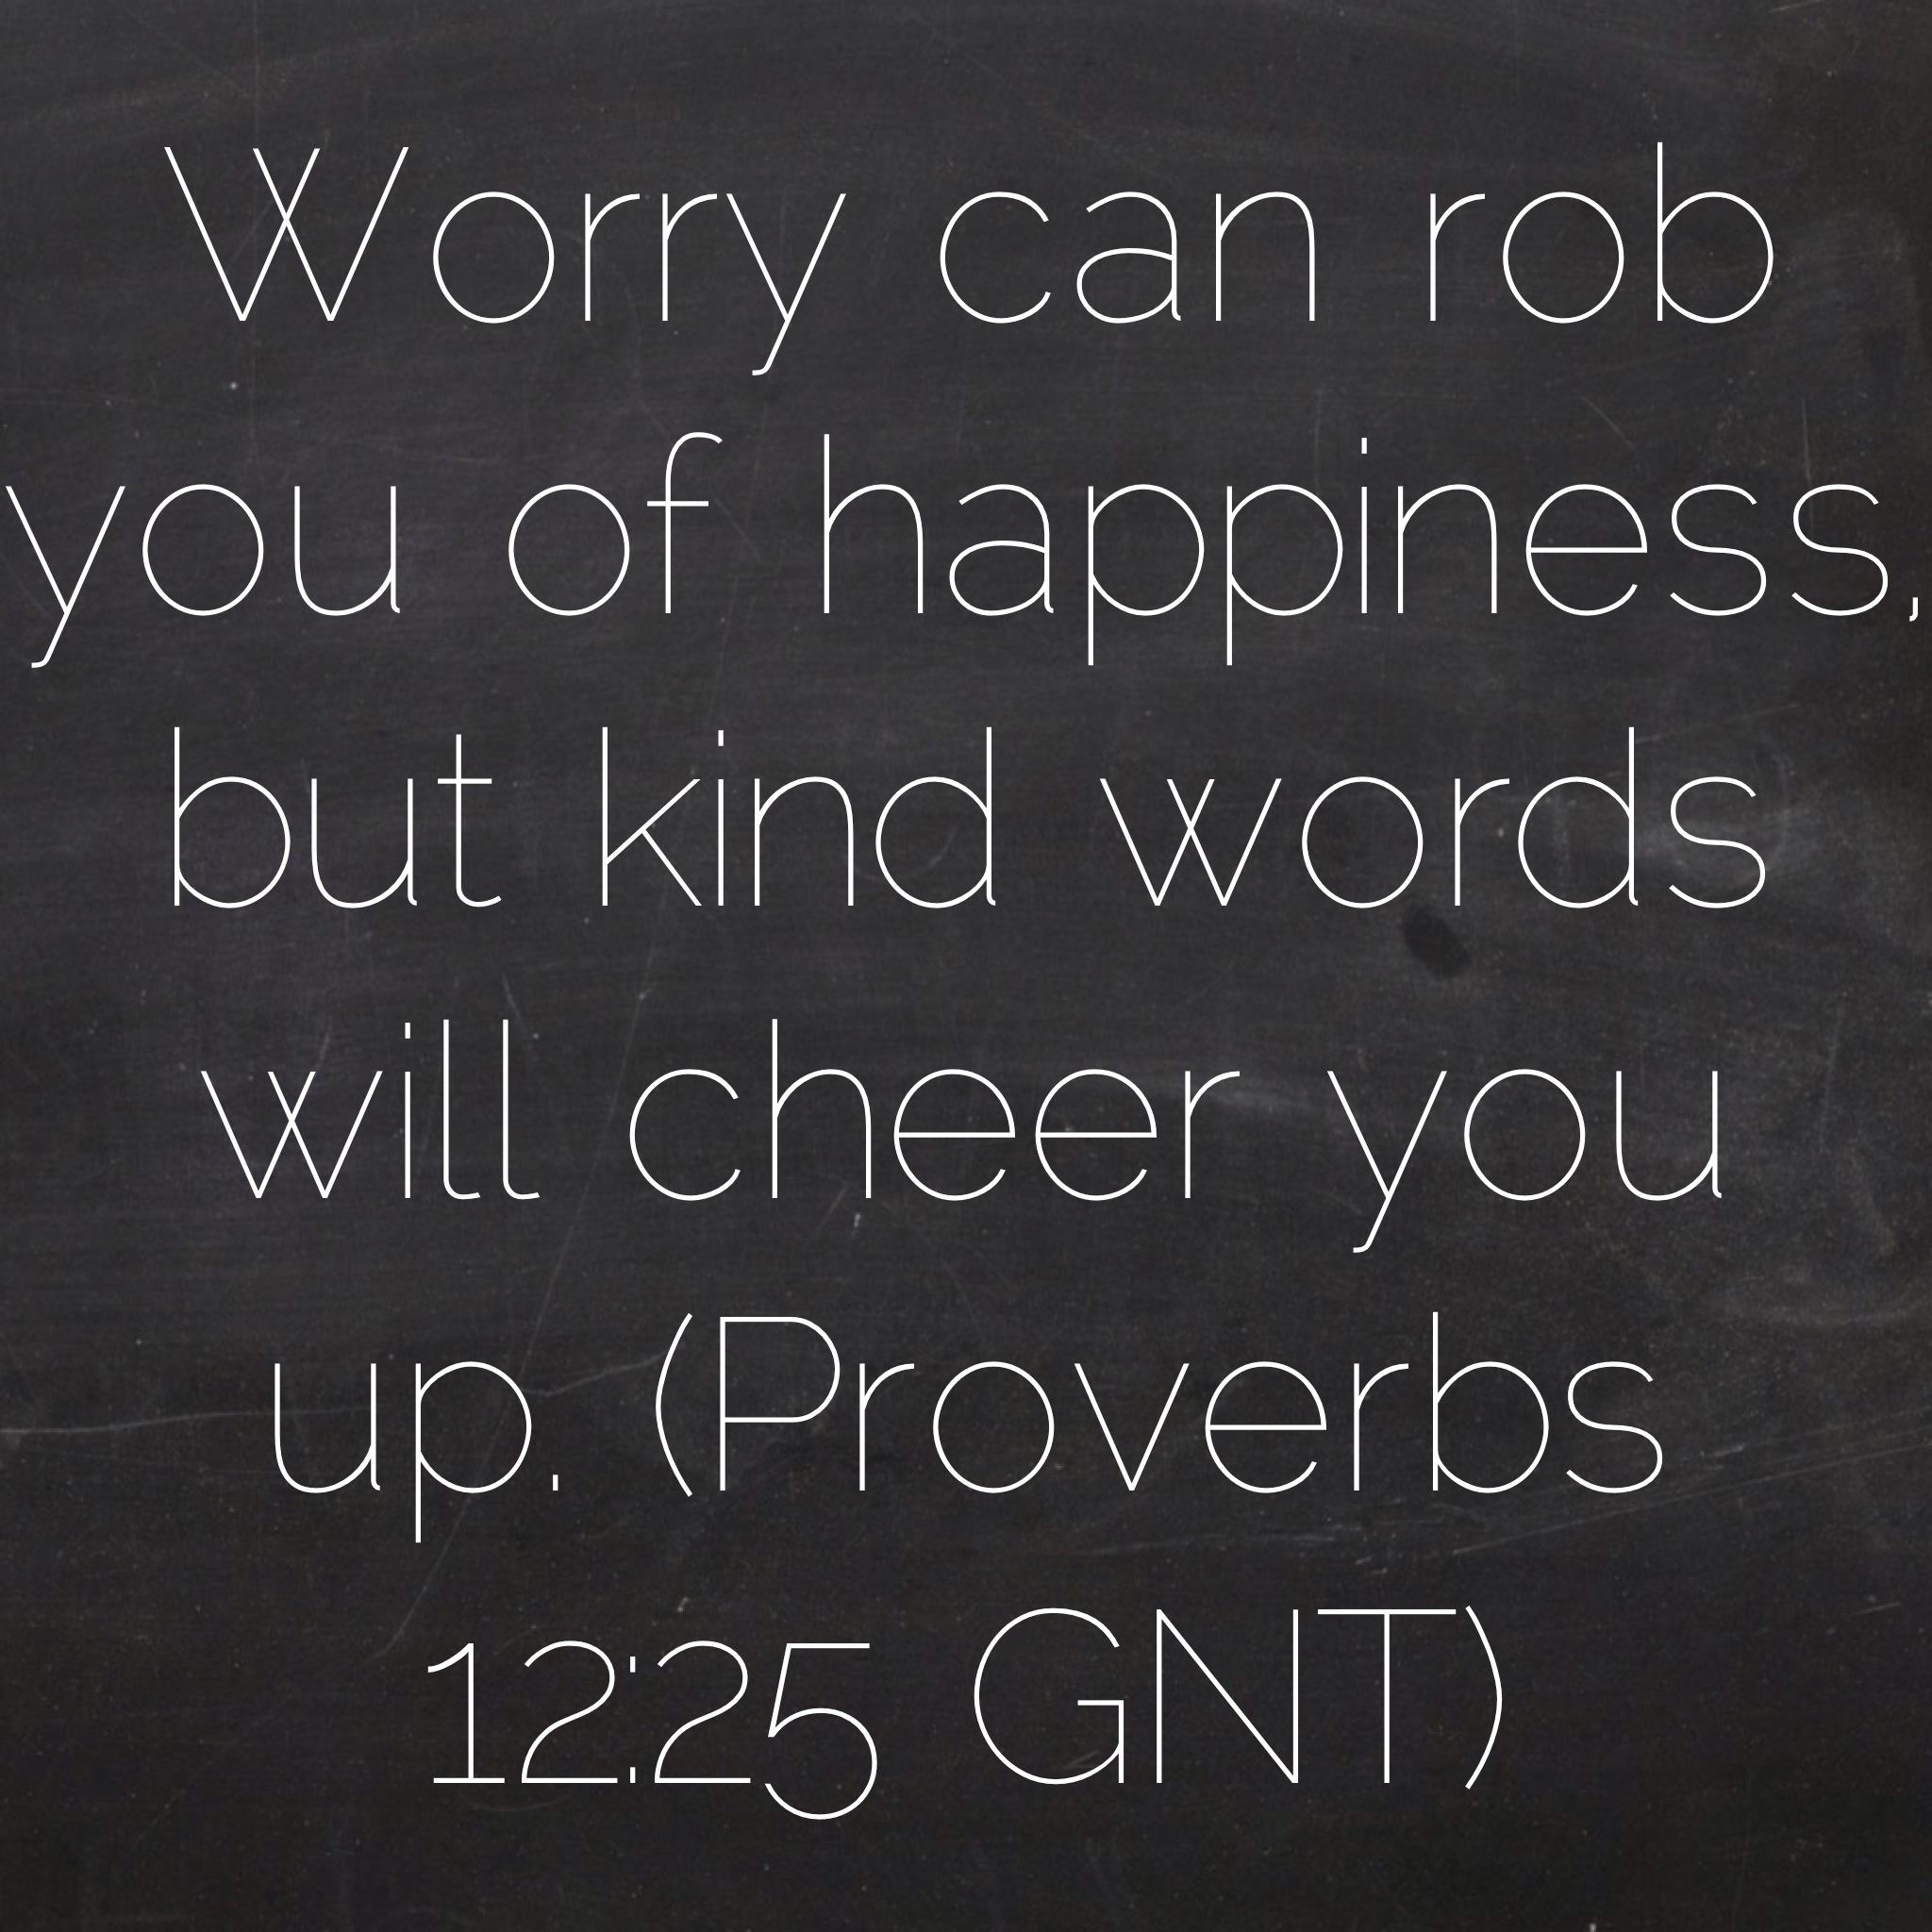 Bible Words Of Wisdom Quotes. QuotesGram